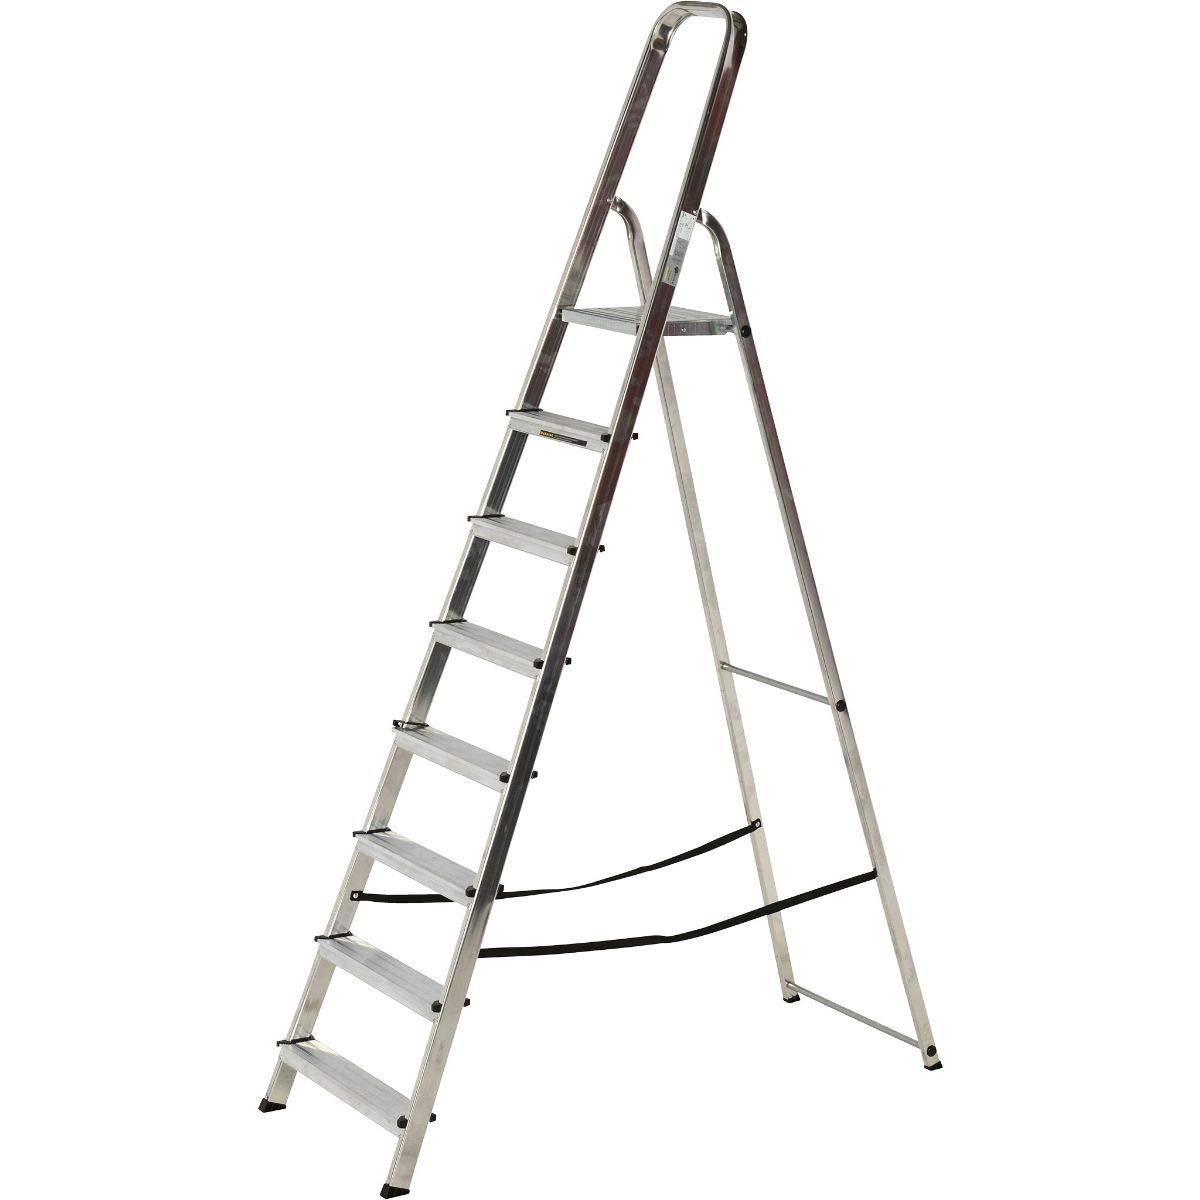 5 Tread Aluminium Step Ladder Class 1 Folding Industrial Trade Youngman Heavy Duty Steps